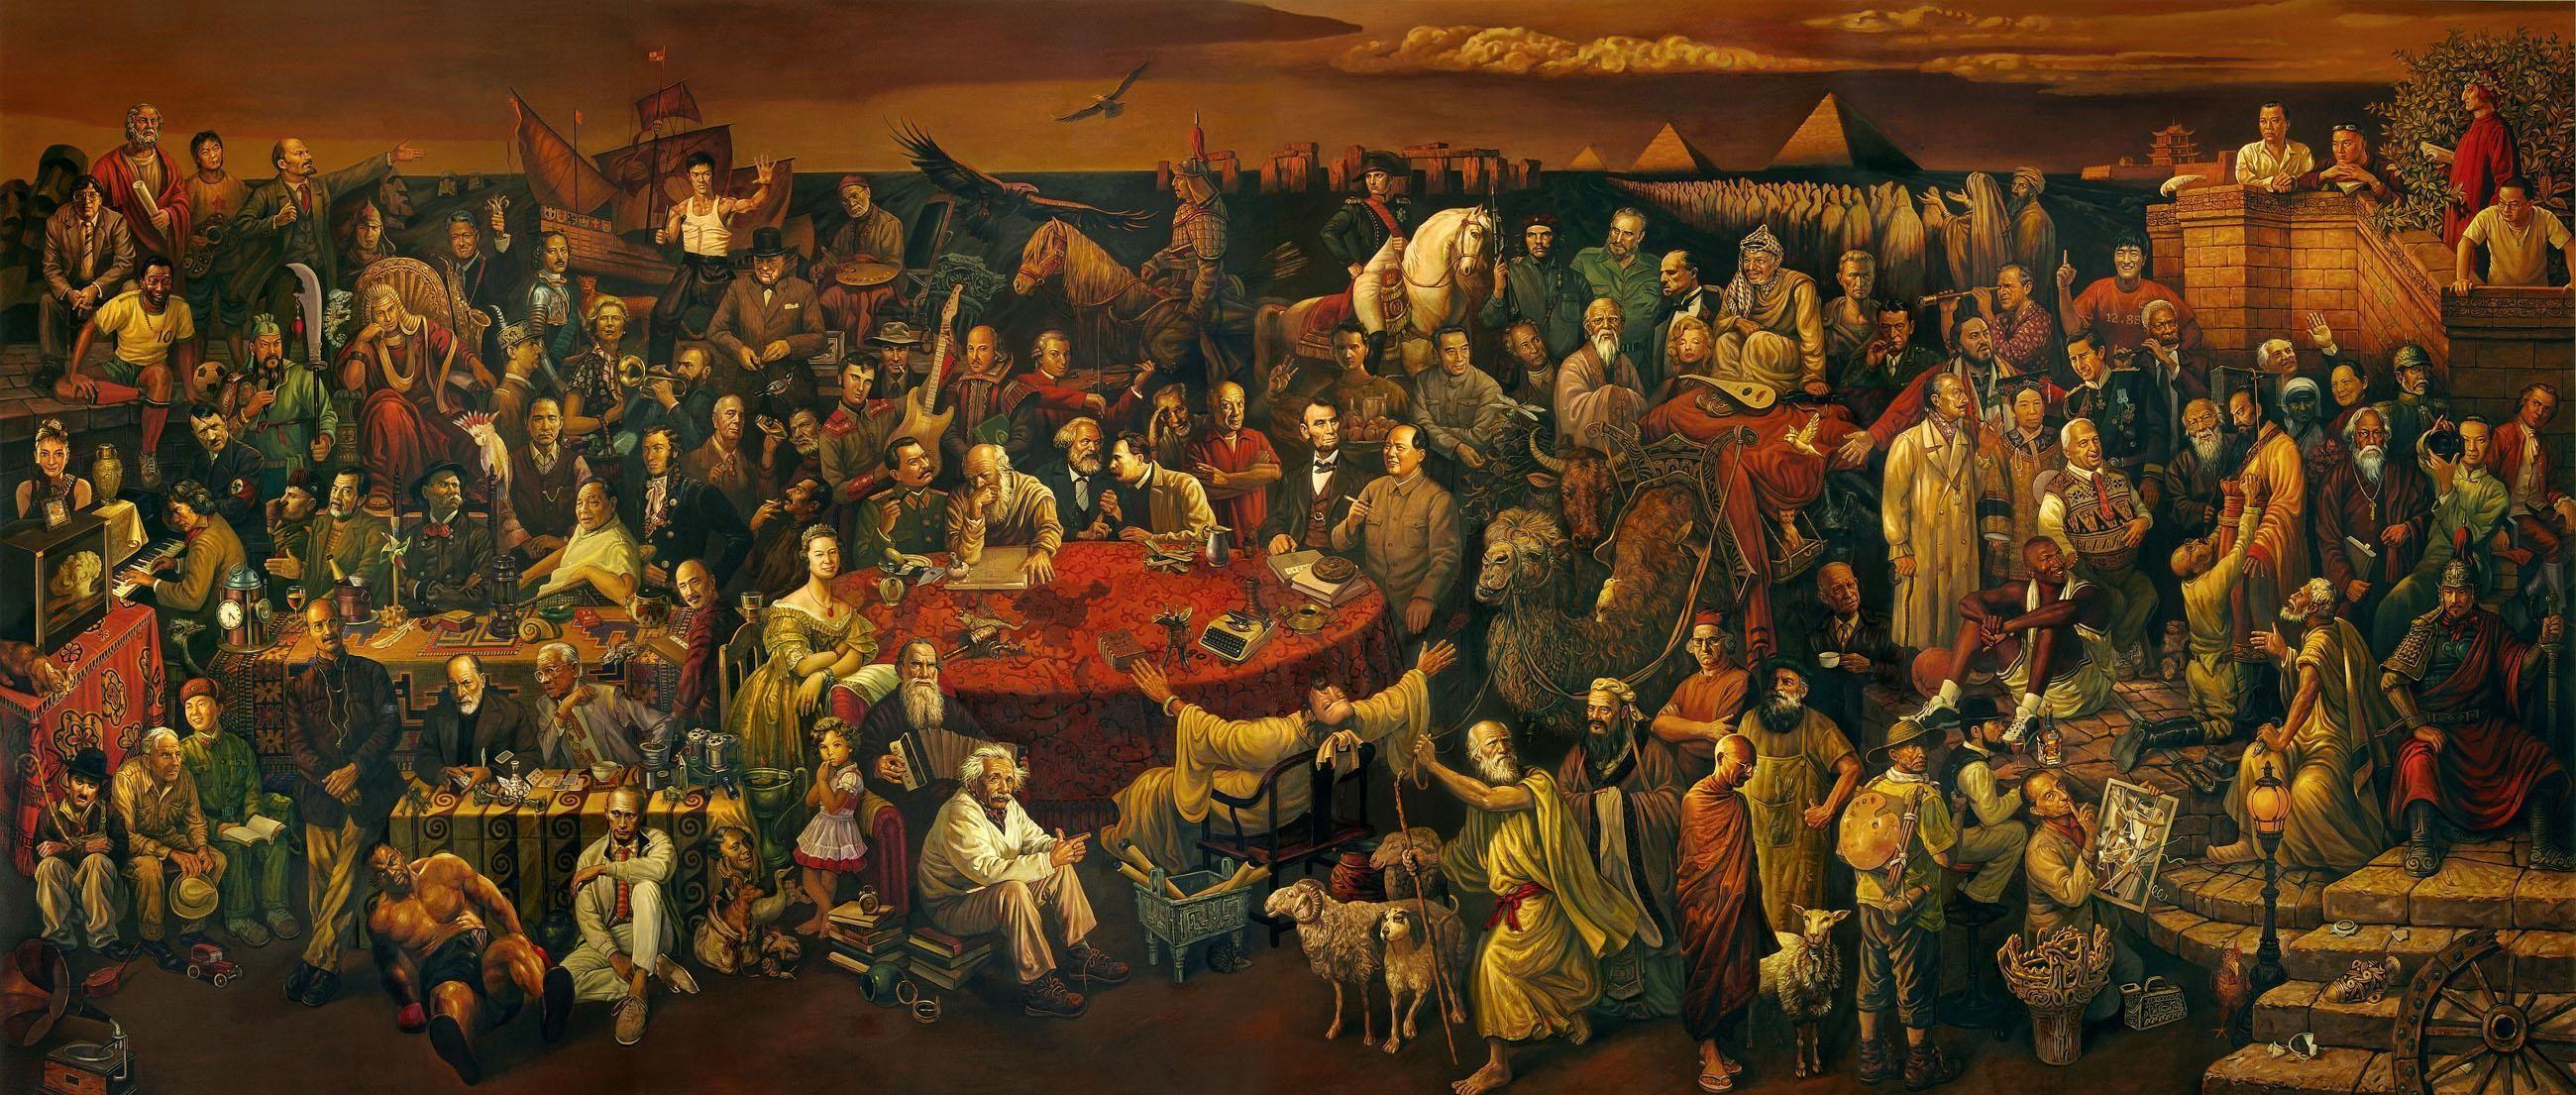 FANTASTIC painting Putin, Einstein, Chaplin, Tyson, Bruce